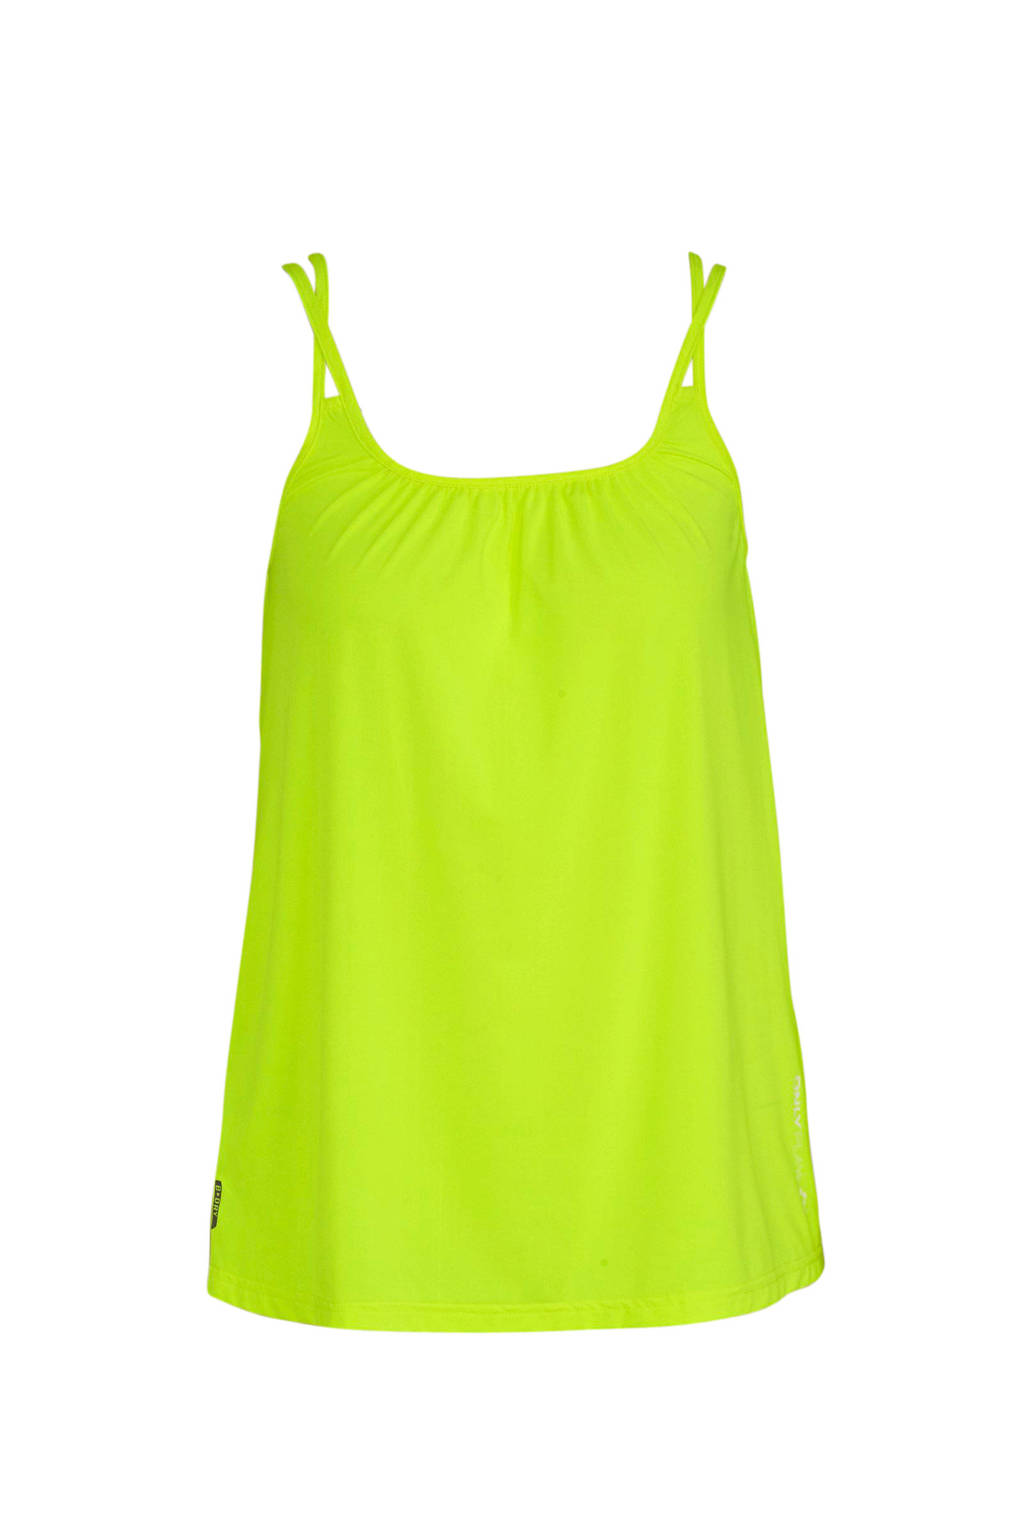 ONLY PLAY sporttop neon geel, Neon geel